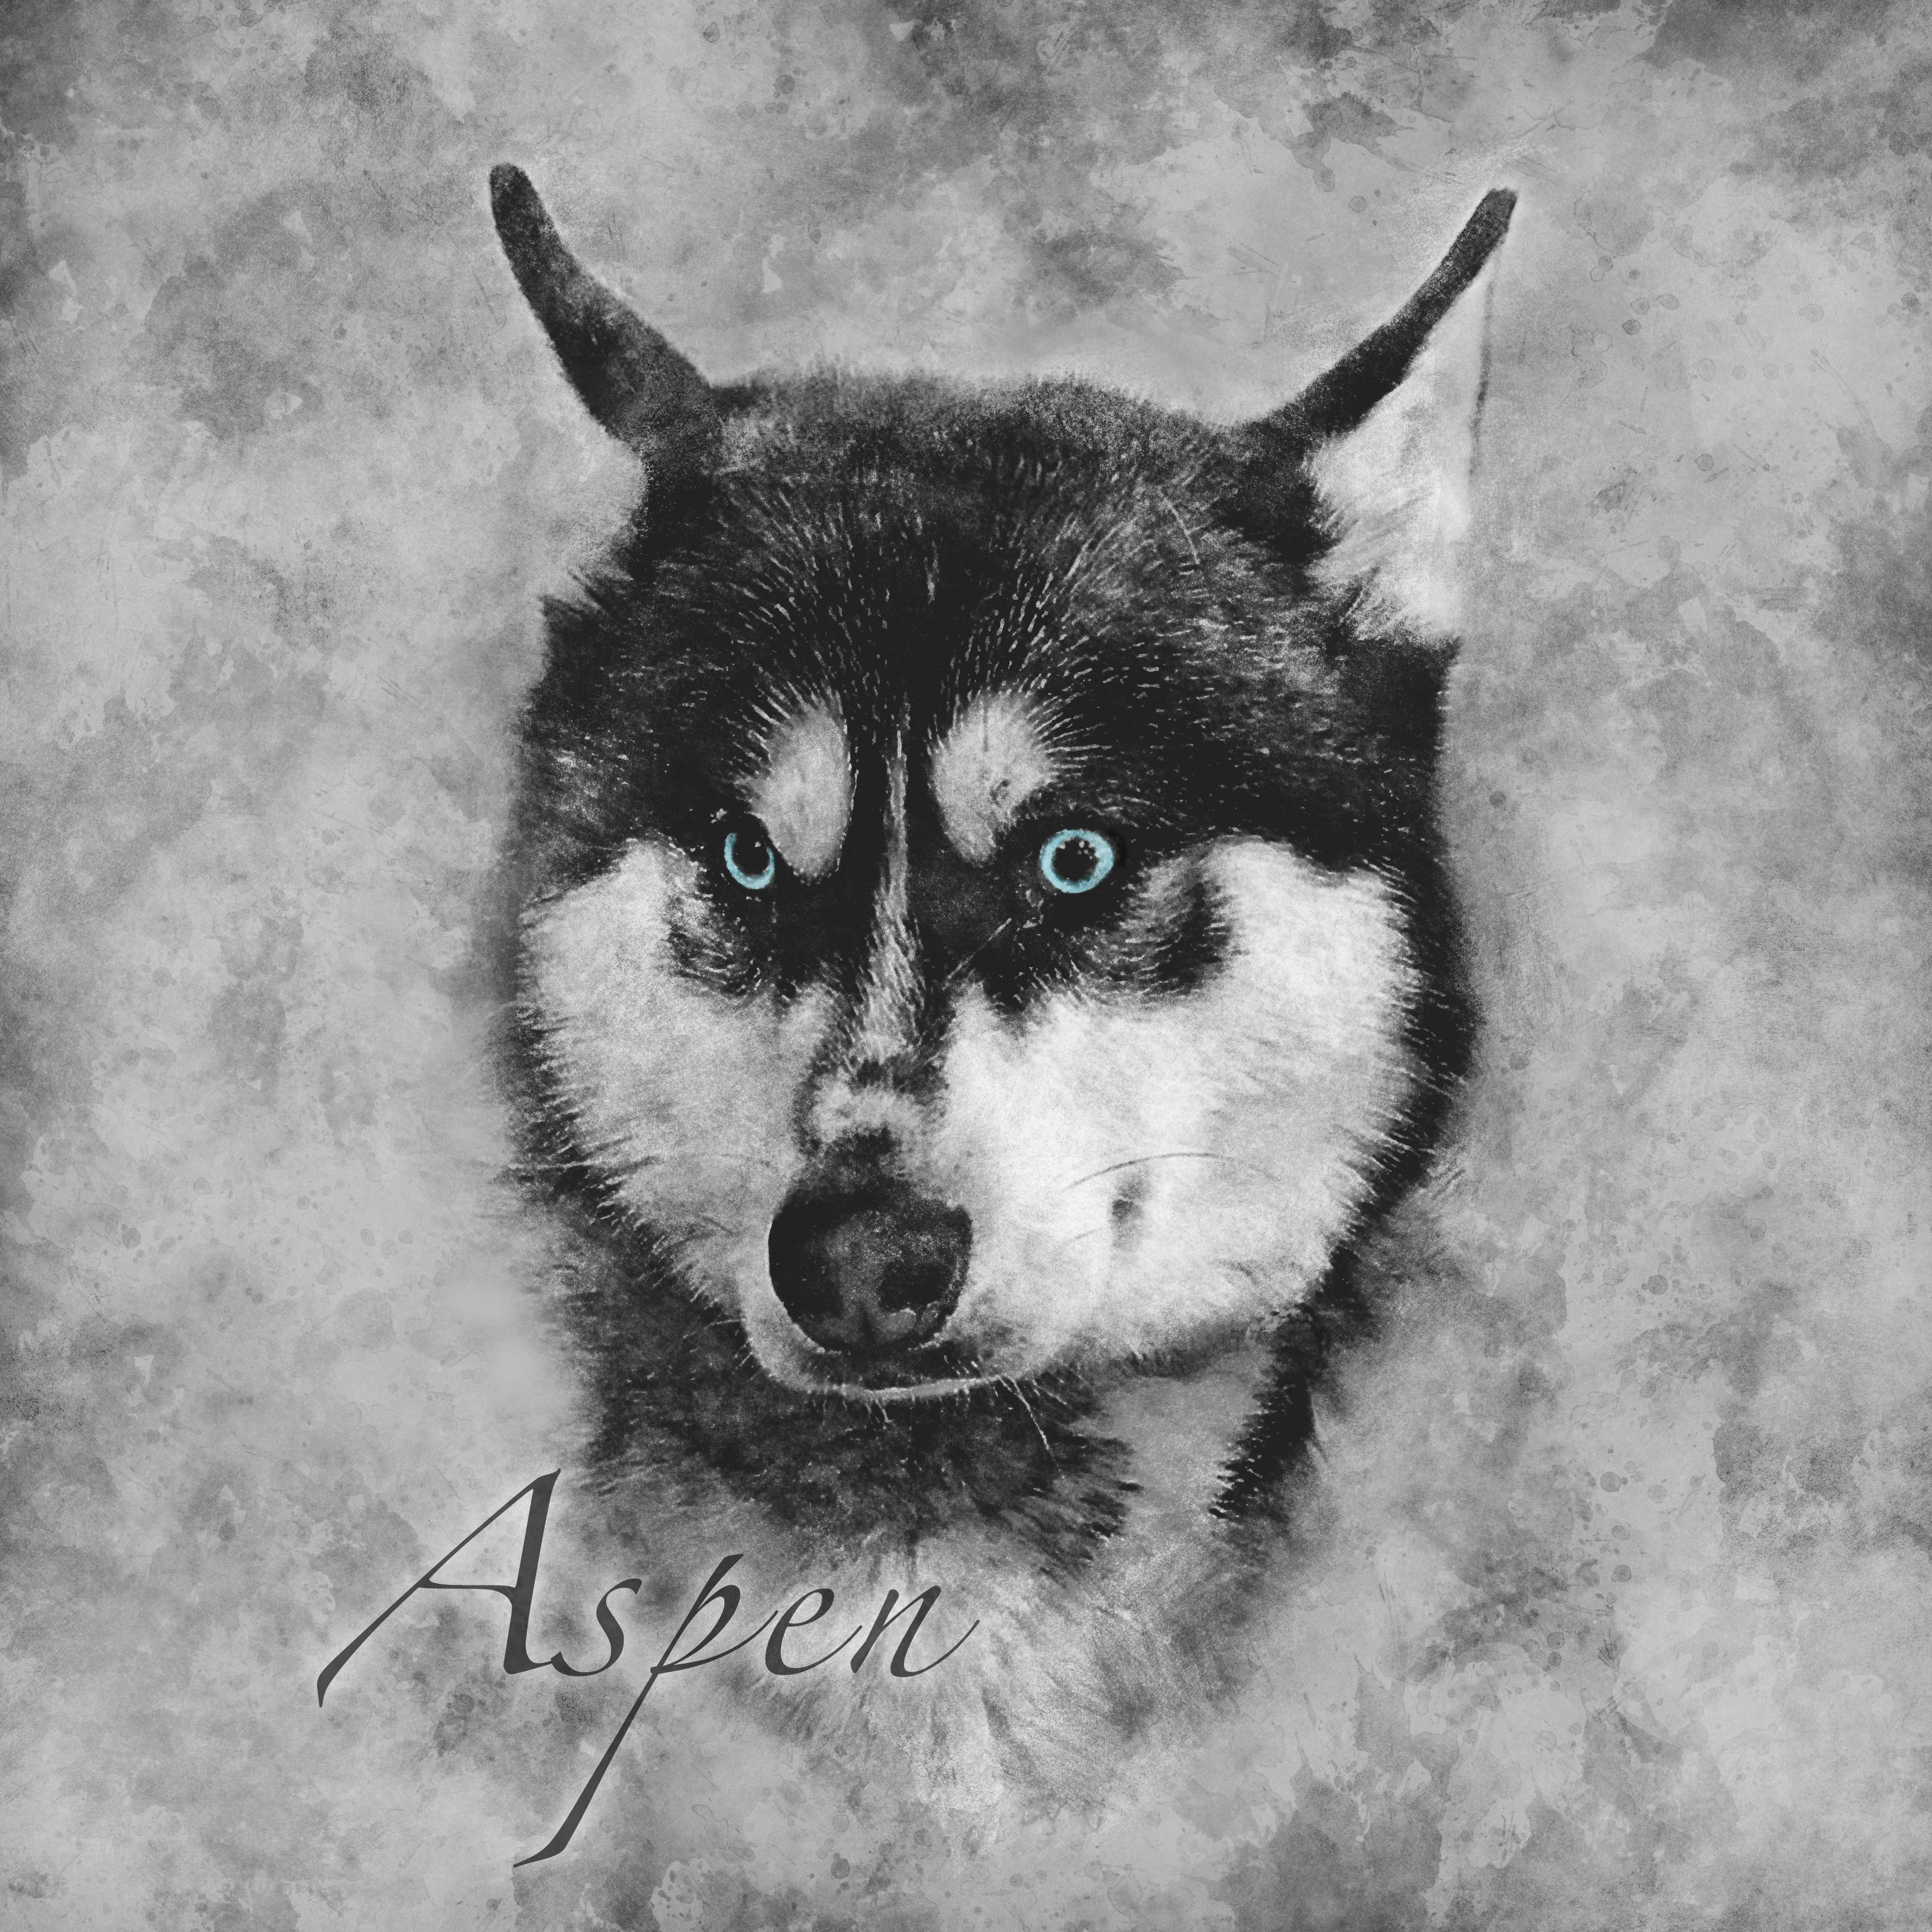 Aspen - Vintage